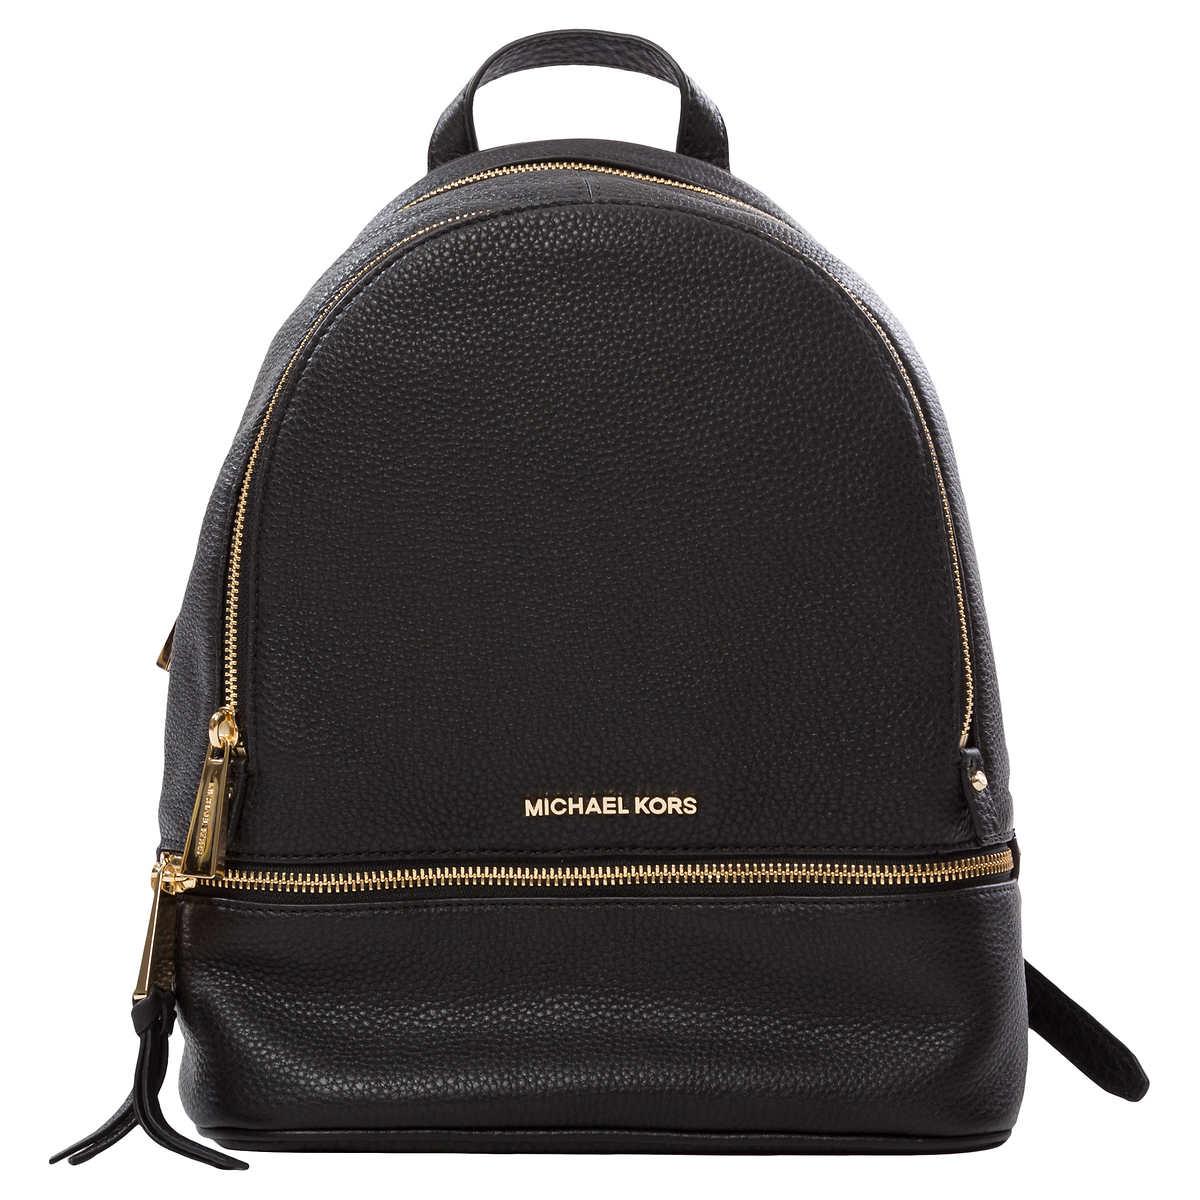 afab2b6359f7 Michael Kors Rhea Medium Backpack, Black